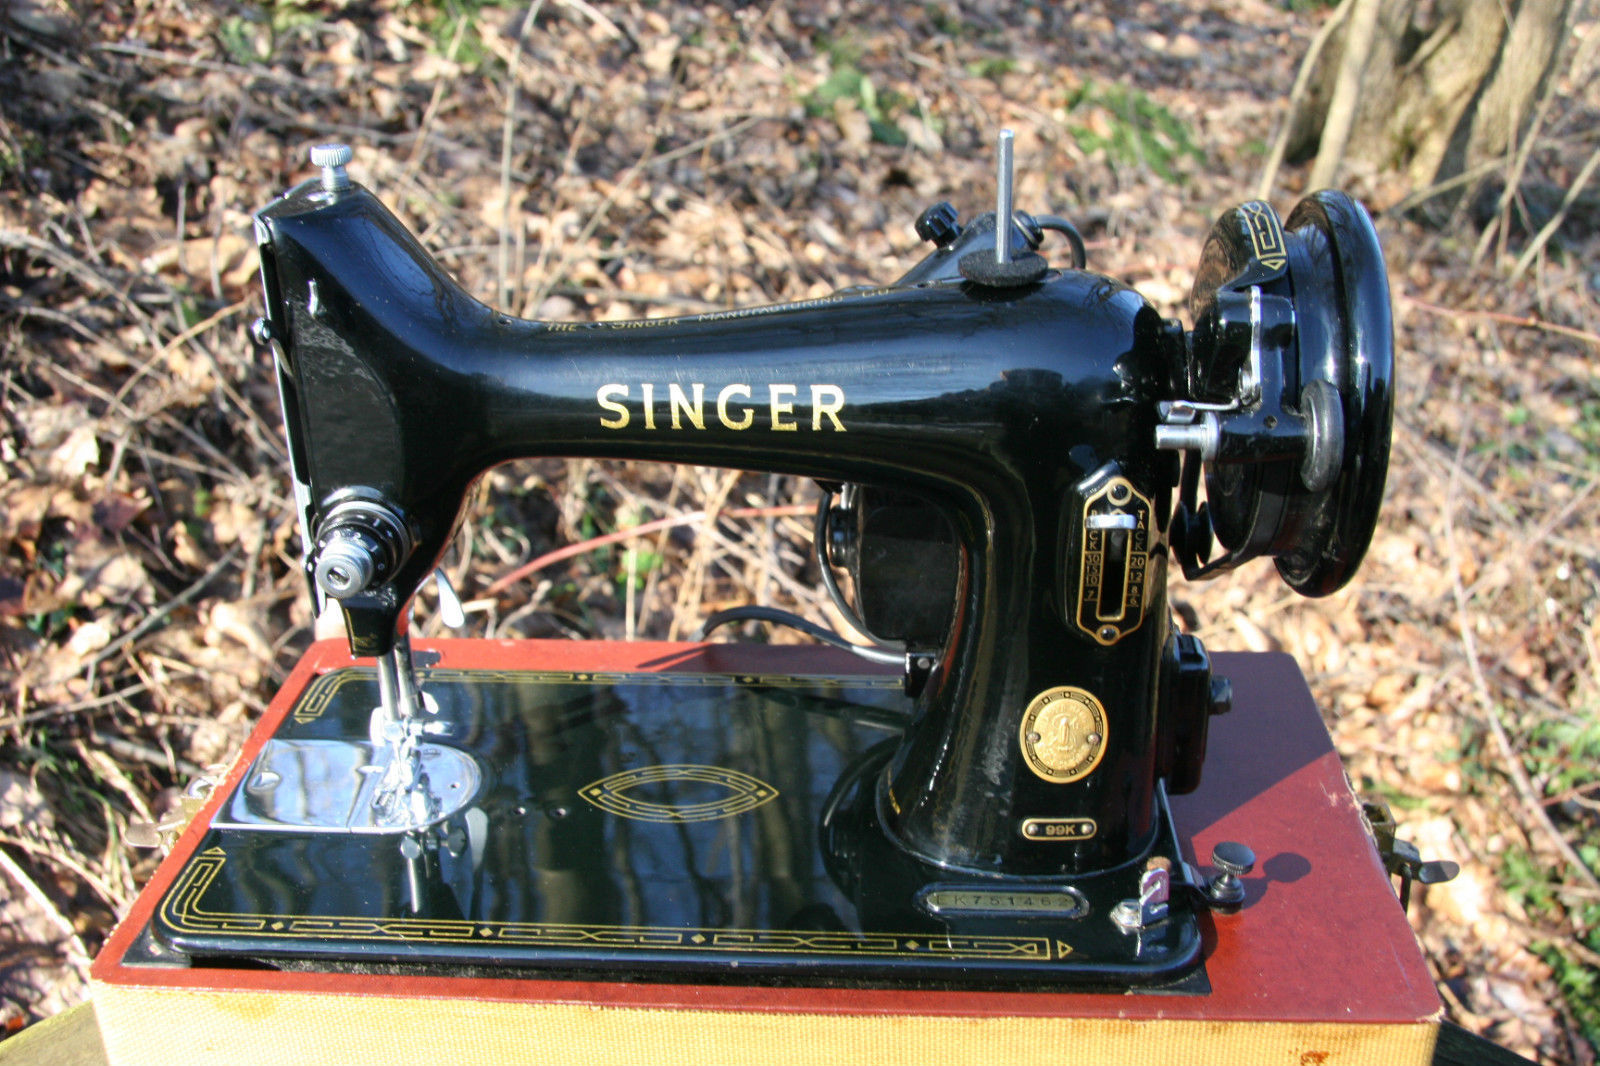 Singer Sewing Machine 99K Belt Cover Guard Part # 33689 5 image 5